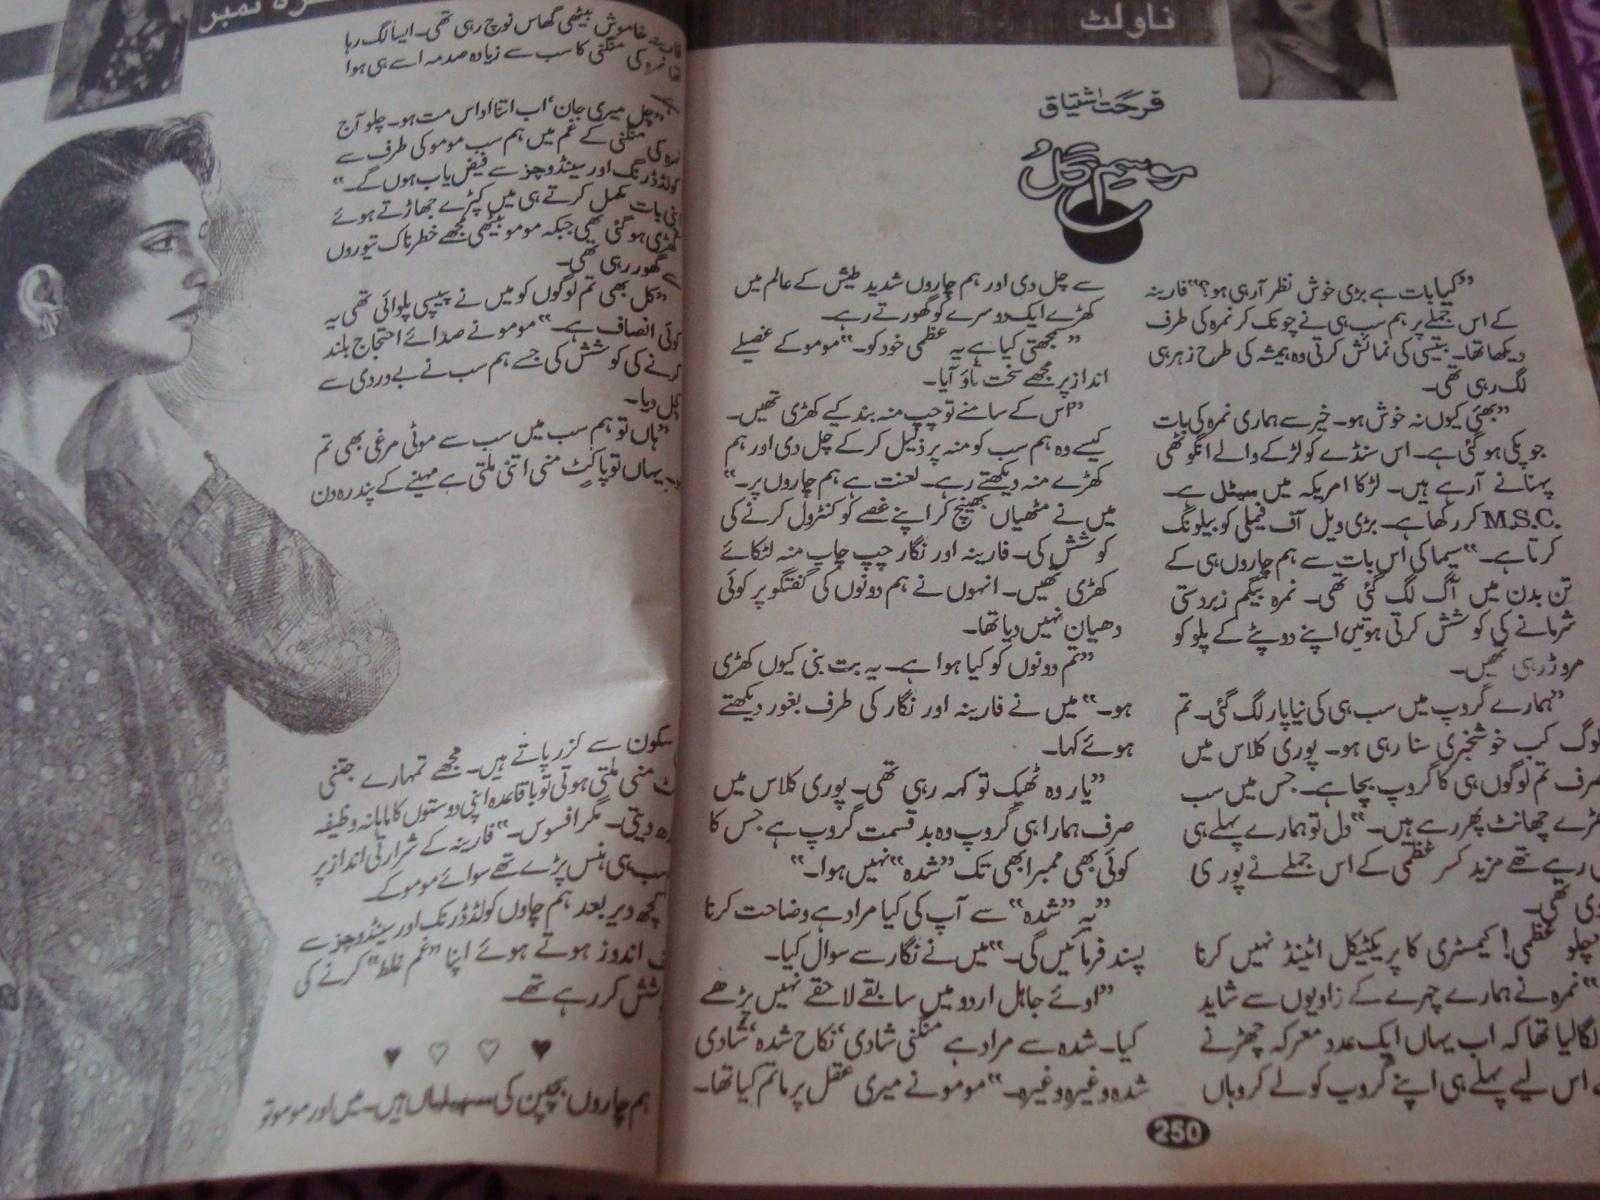 mosamegulbyfarhatishtiaq p1 1 - Mausam e Gul by Farhat Ishtiaq